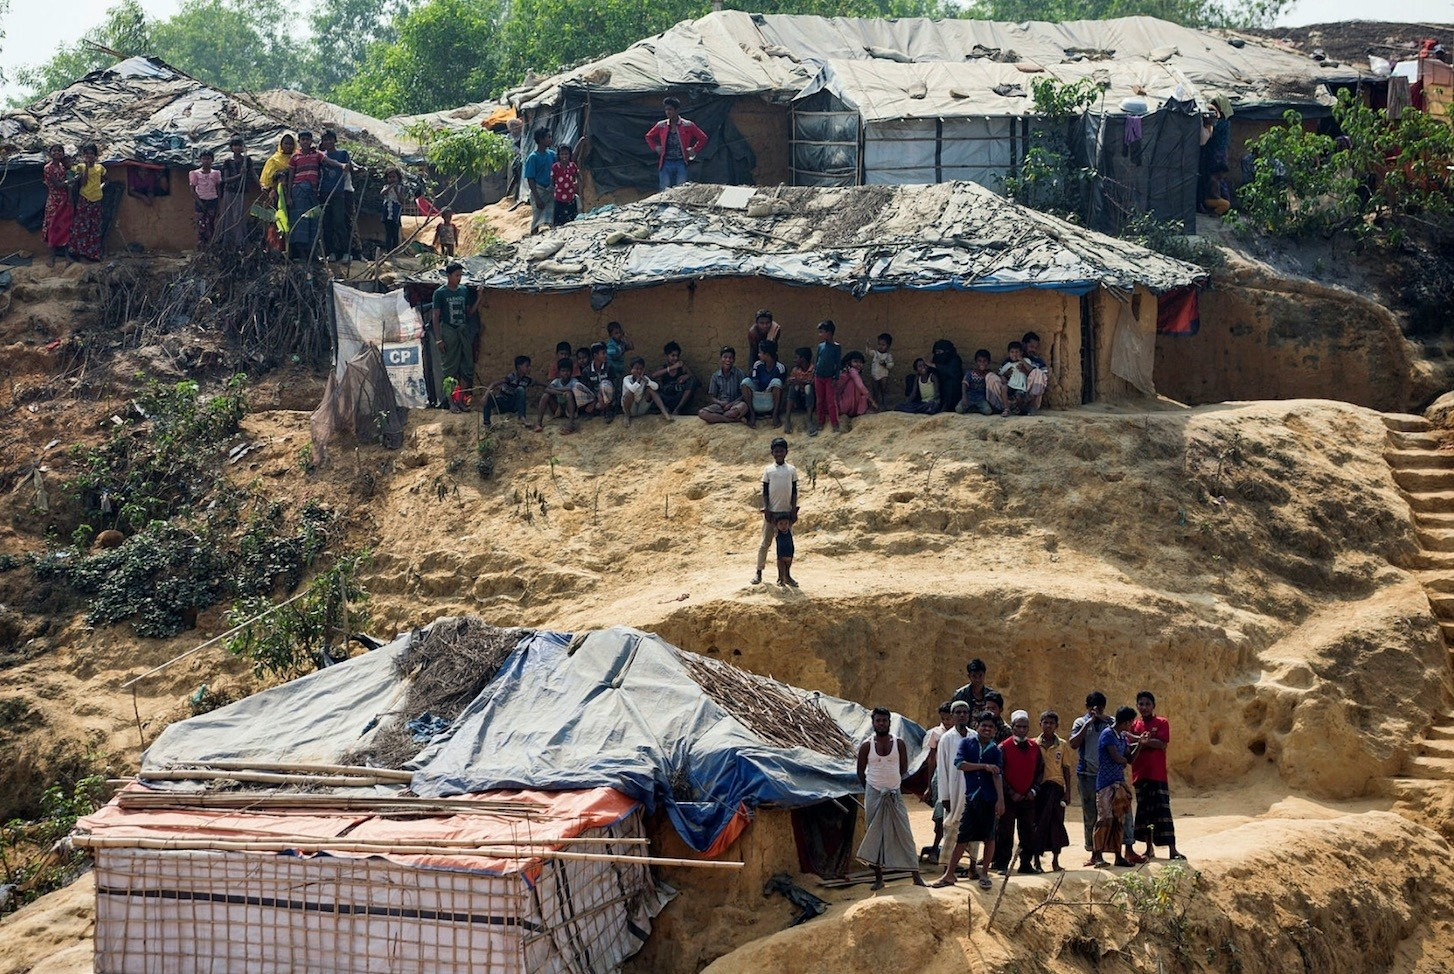 Rohingya refugees in the Kutupalong Rohingya refugee camp, Coxu2019s Bazar, Bangladesh, Feb. 6.